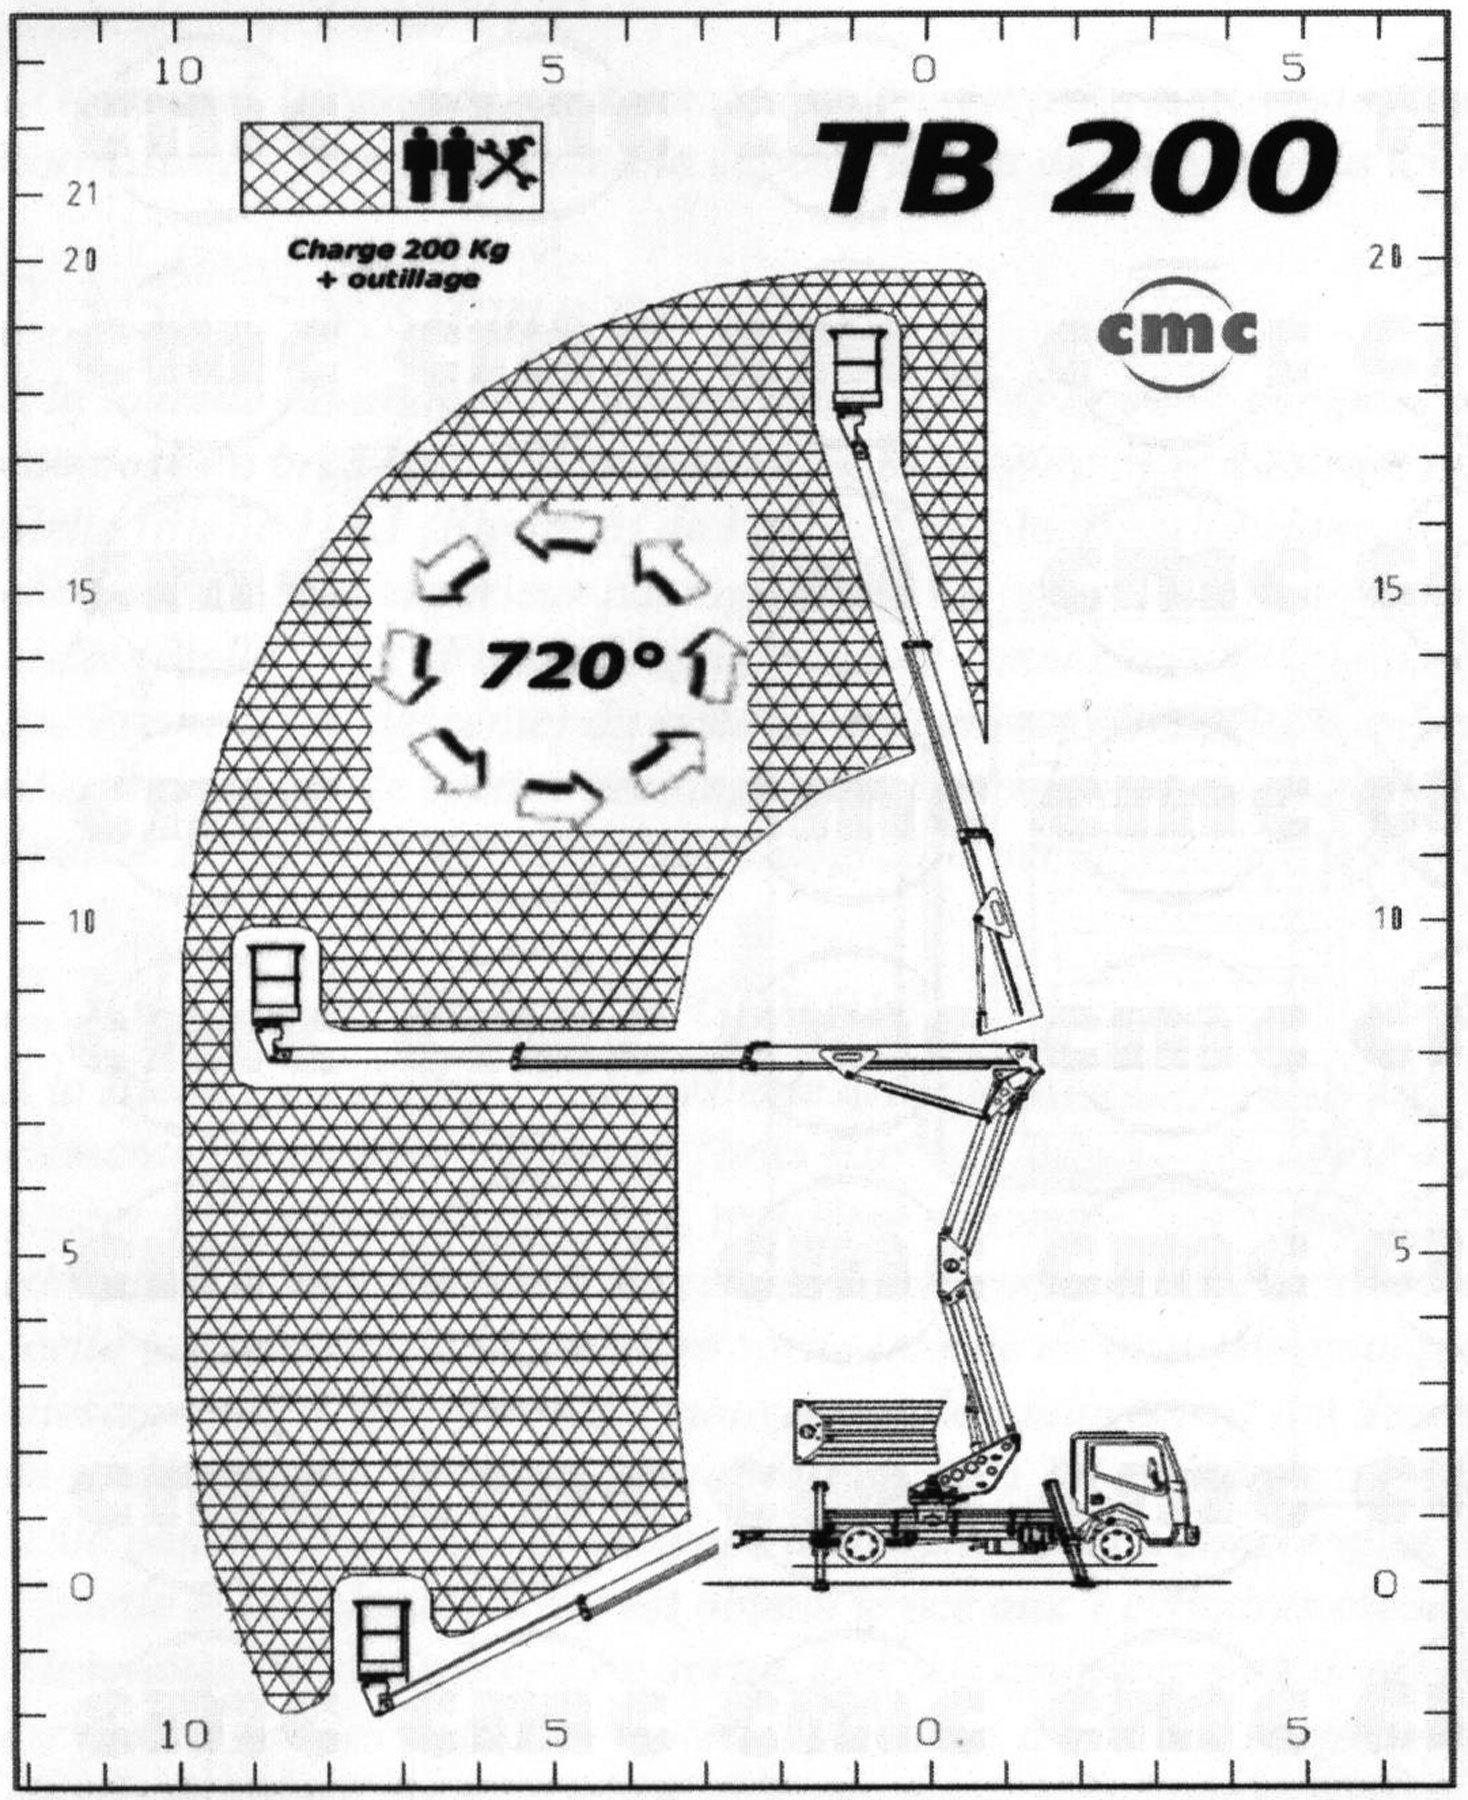 VL-20-graphic